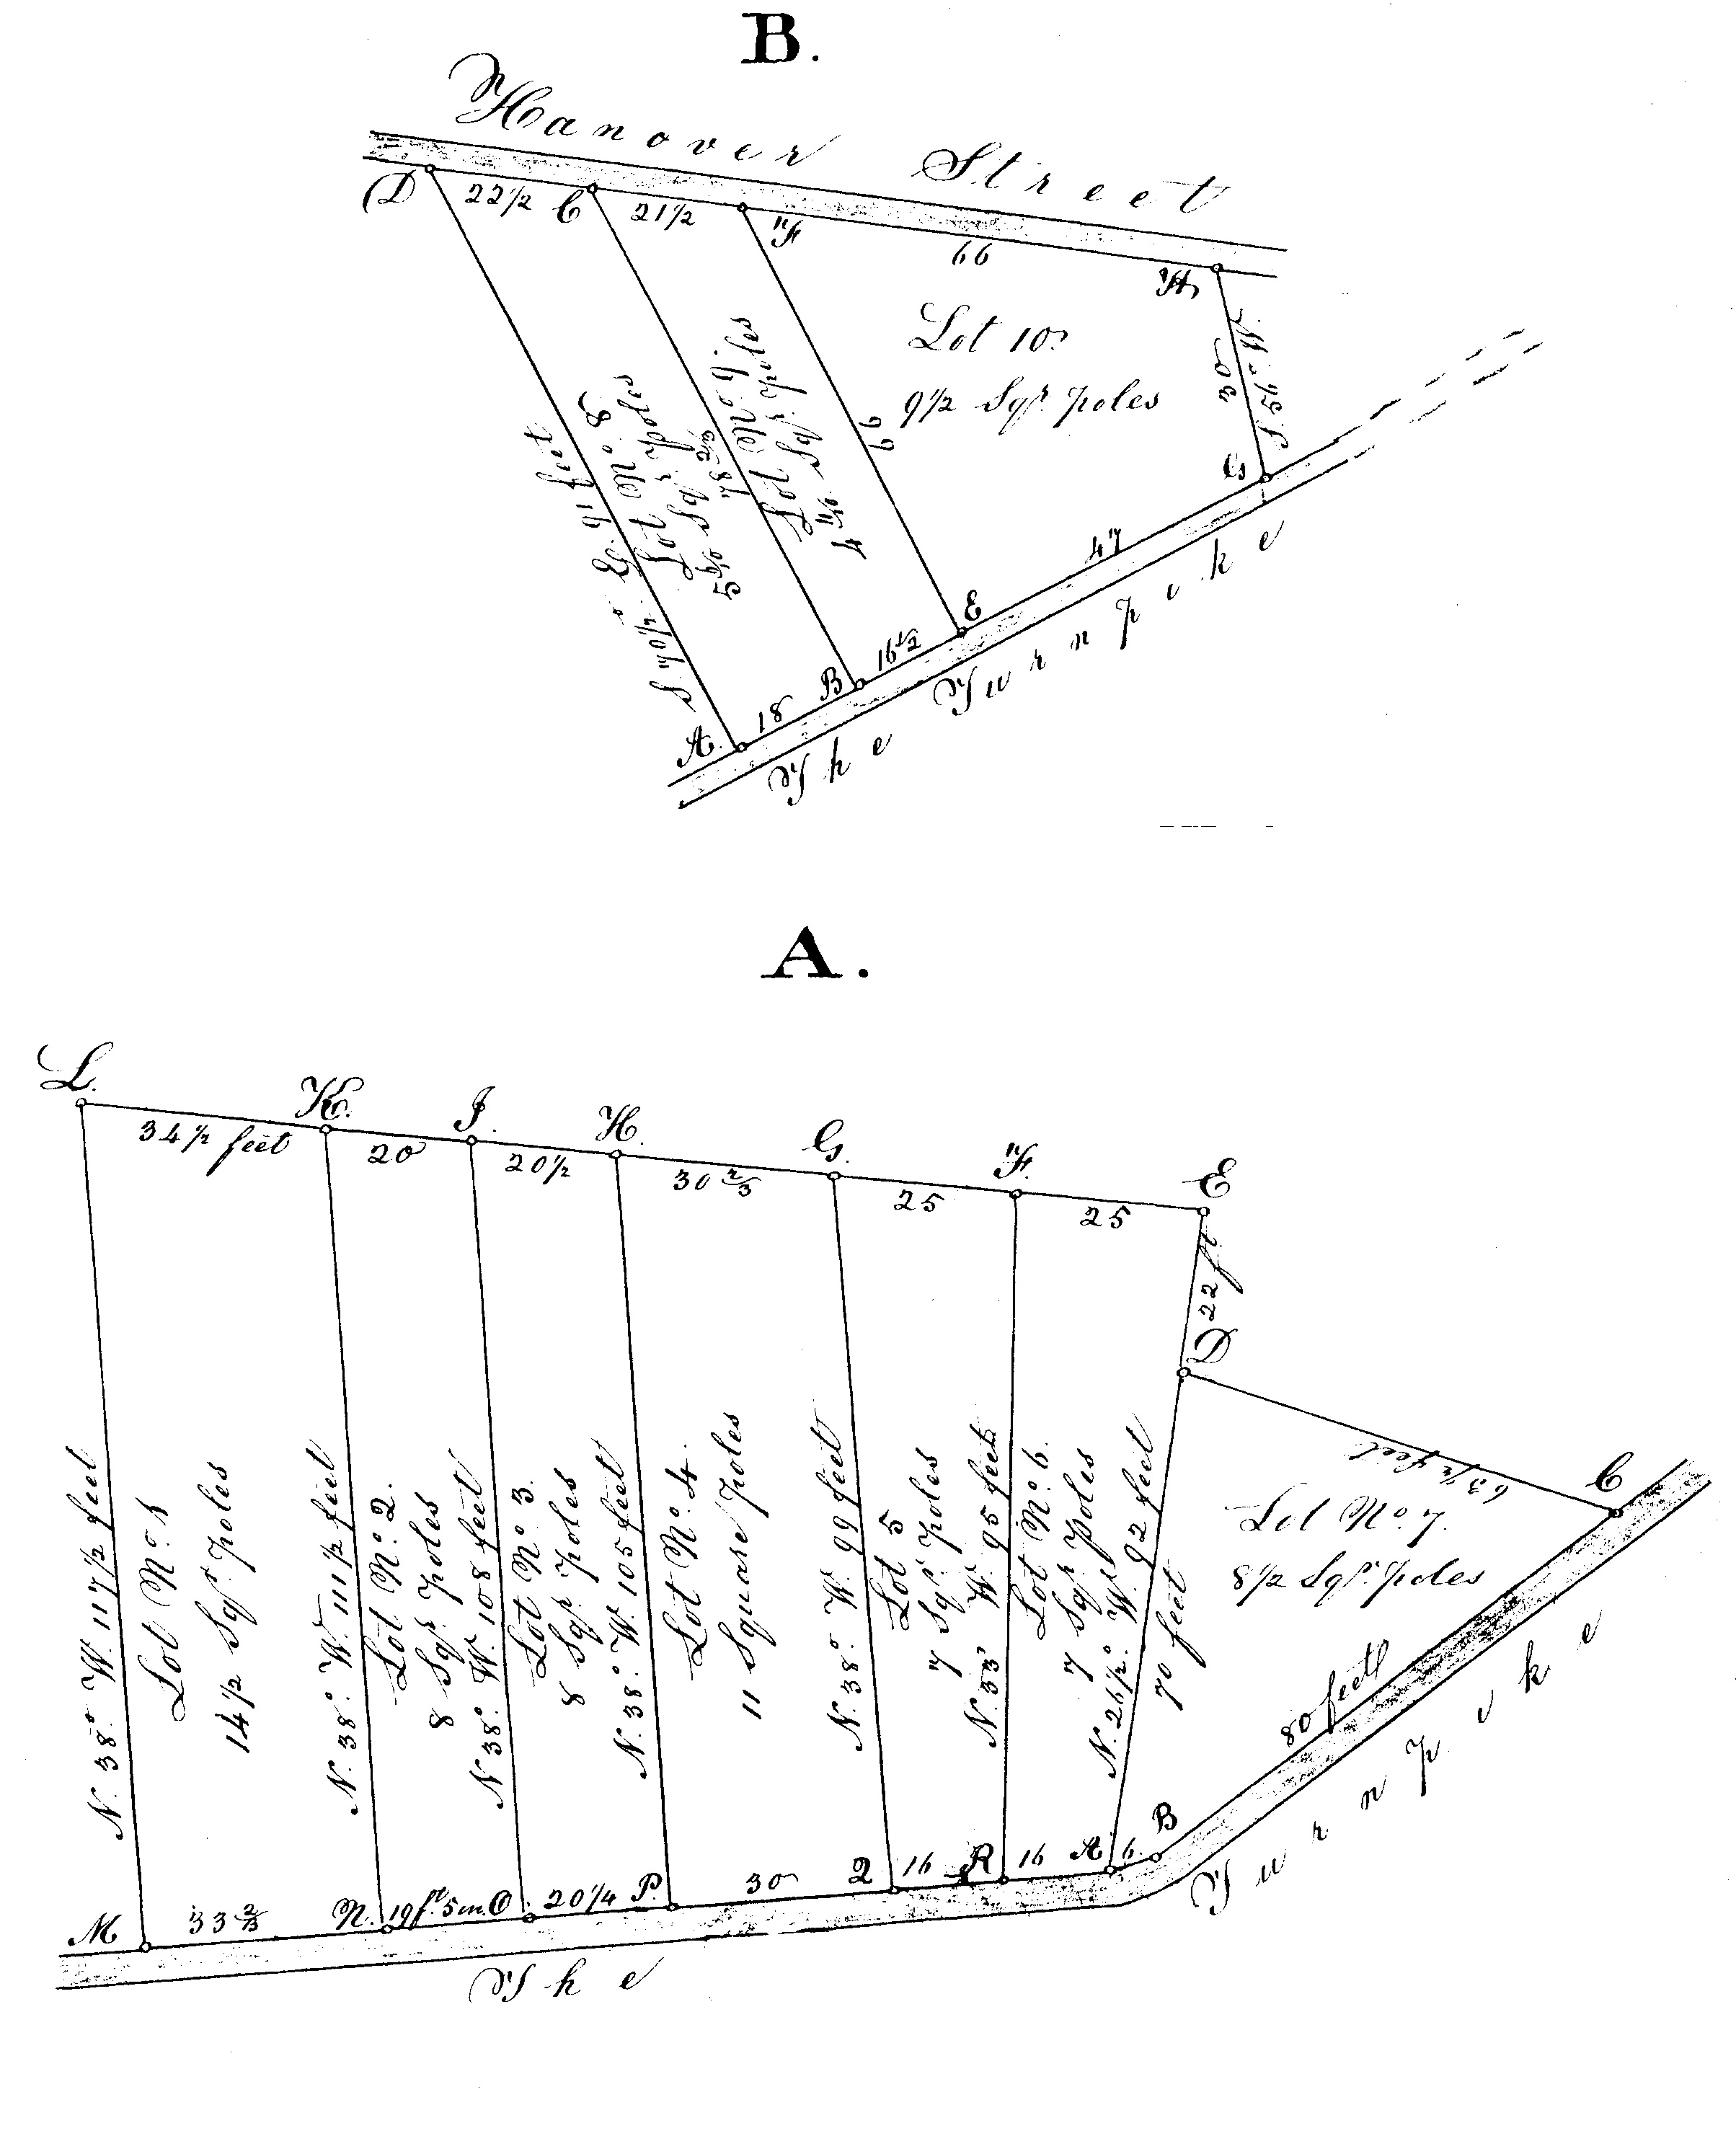 Historic Plats of Fredericksburg, VA on hobart dishwasher schematics, hobart dishwasher electrical wiring, hobart c44a wiring schematic, hobart parts,